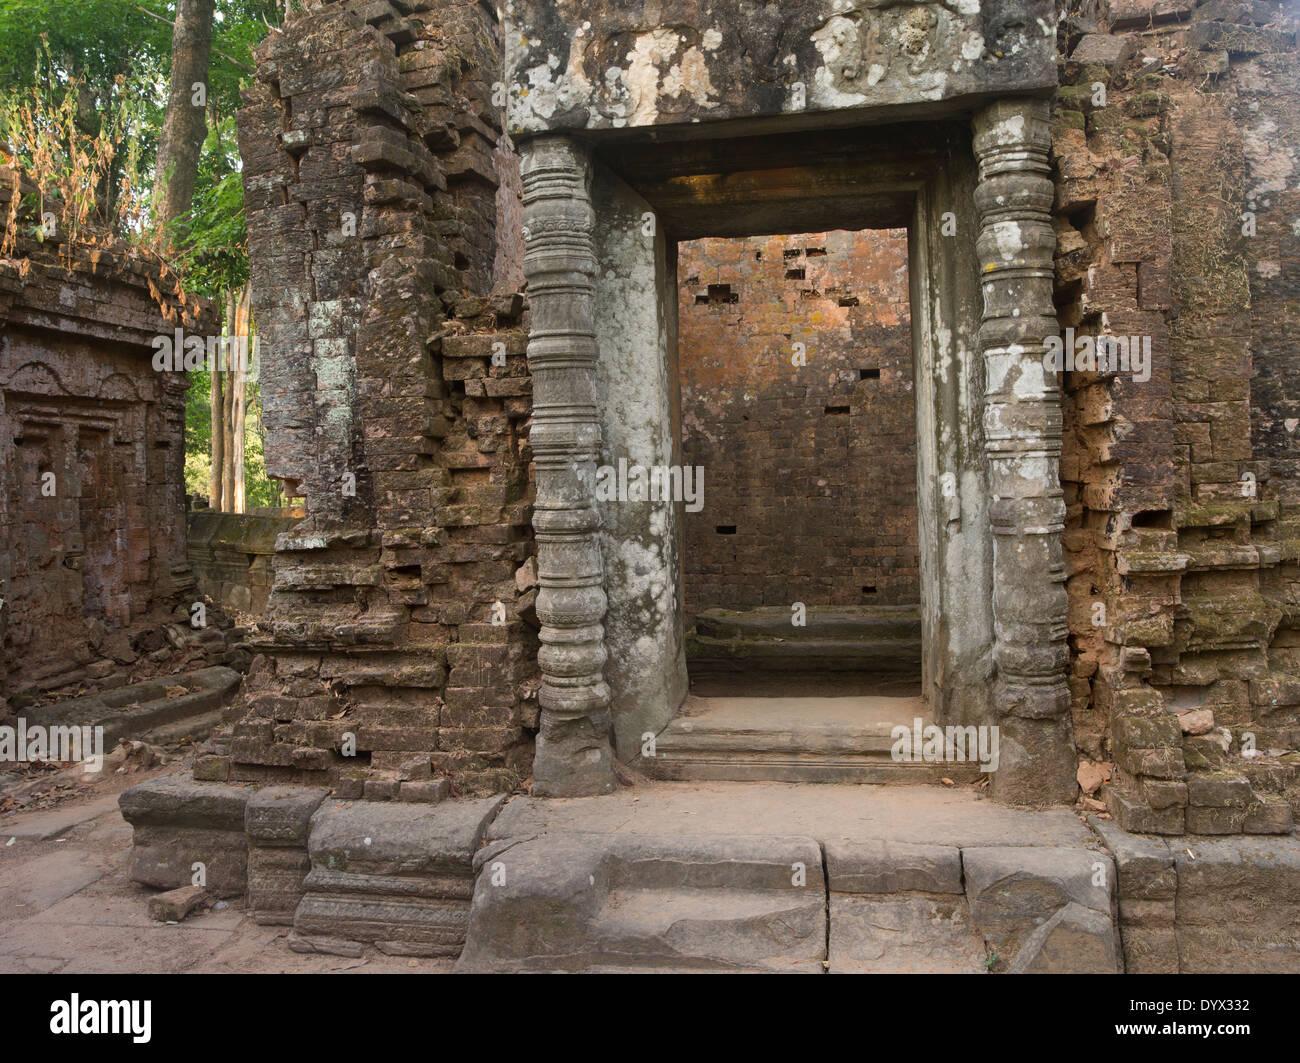 Prasat Thom the principal monument of Koh Ker 127 NE of Siem Reap, Cambodia - Stock Image